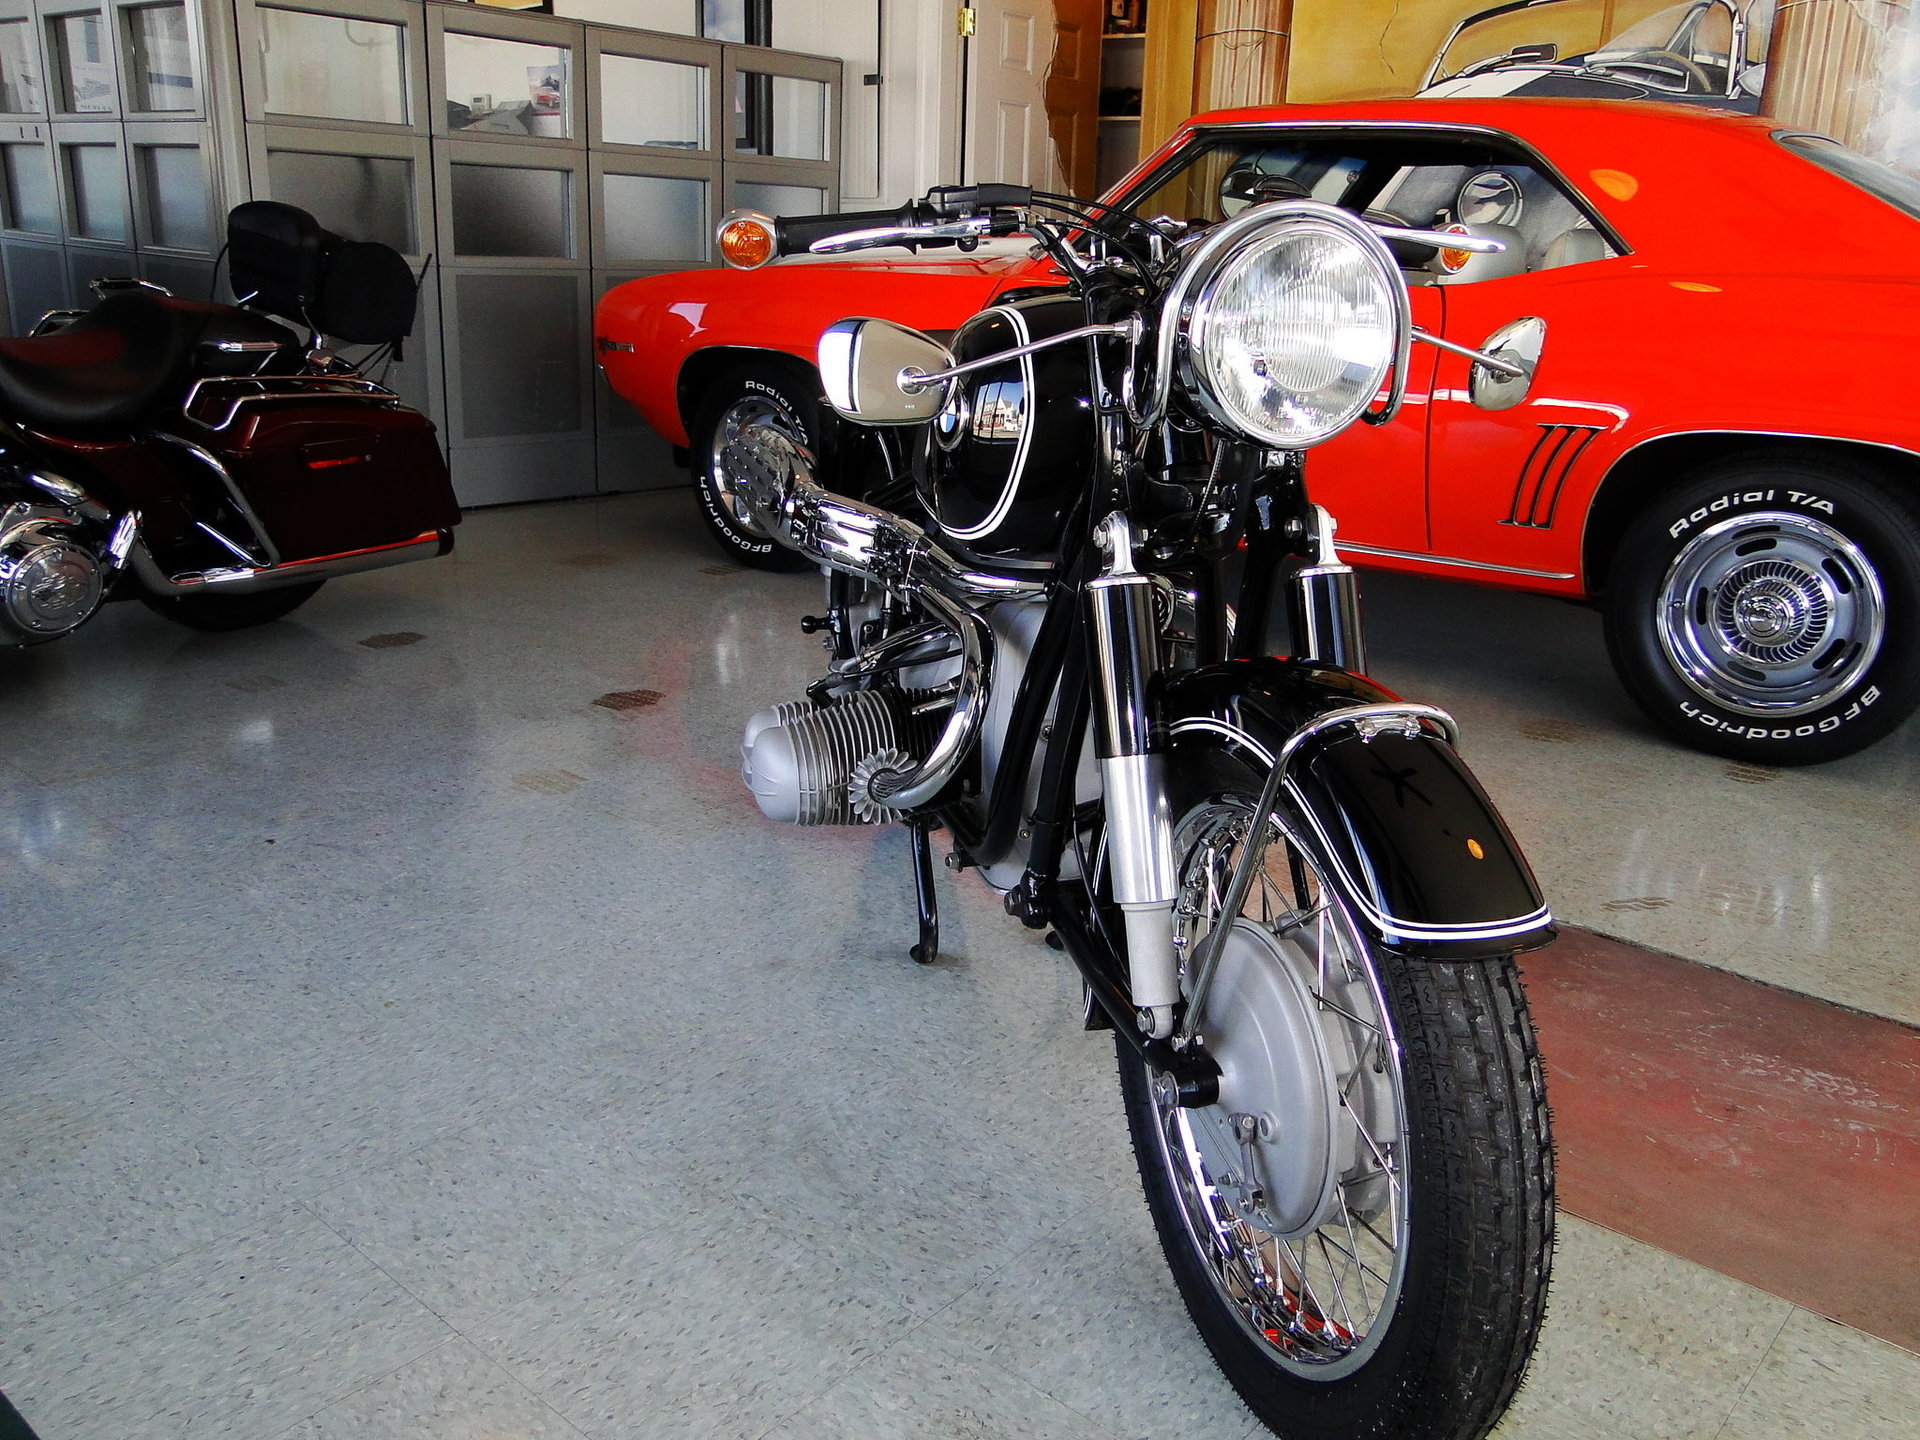 1962 BMW R69S | Legendary Motors - Classic Cars, Muscle ...